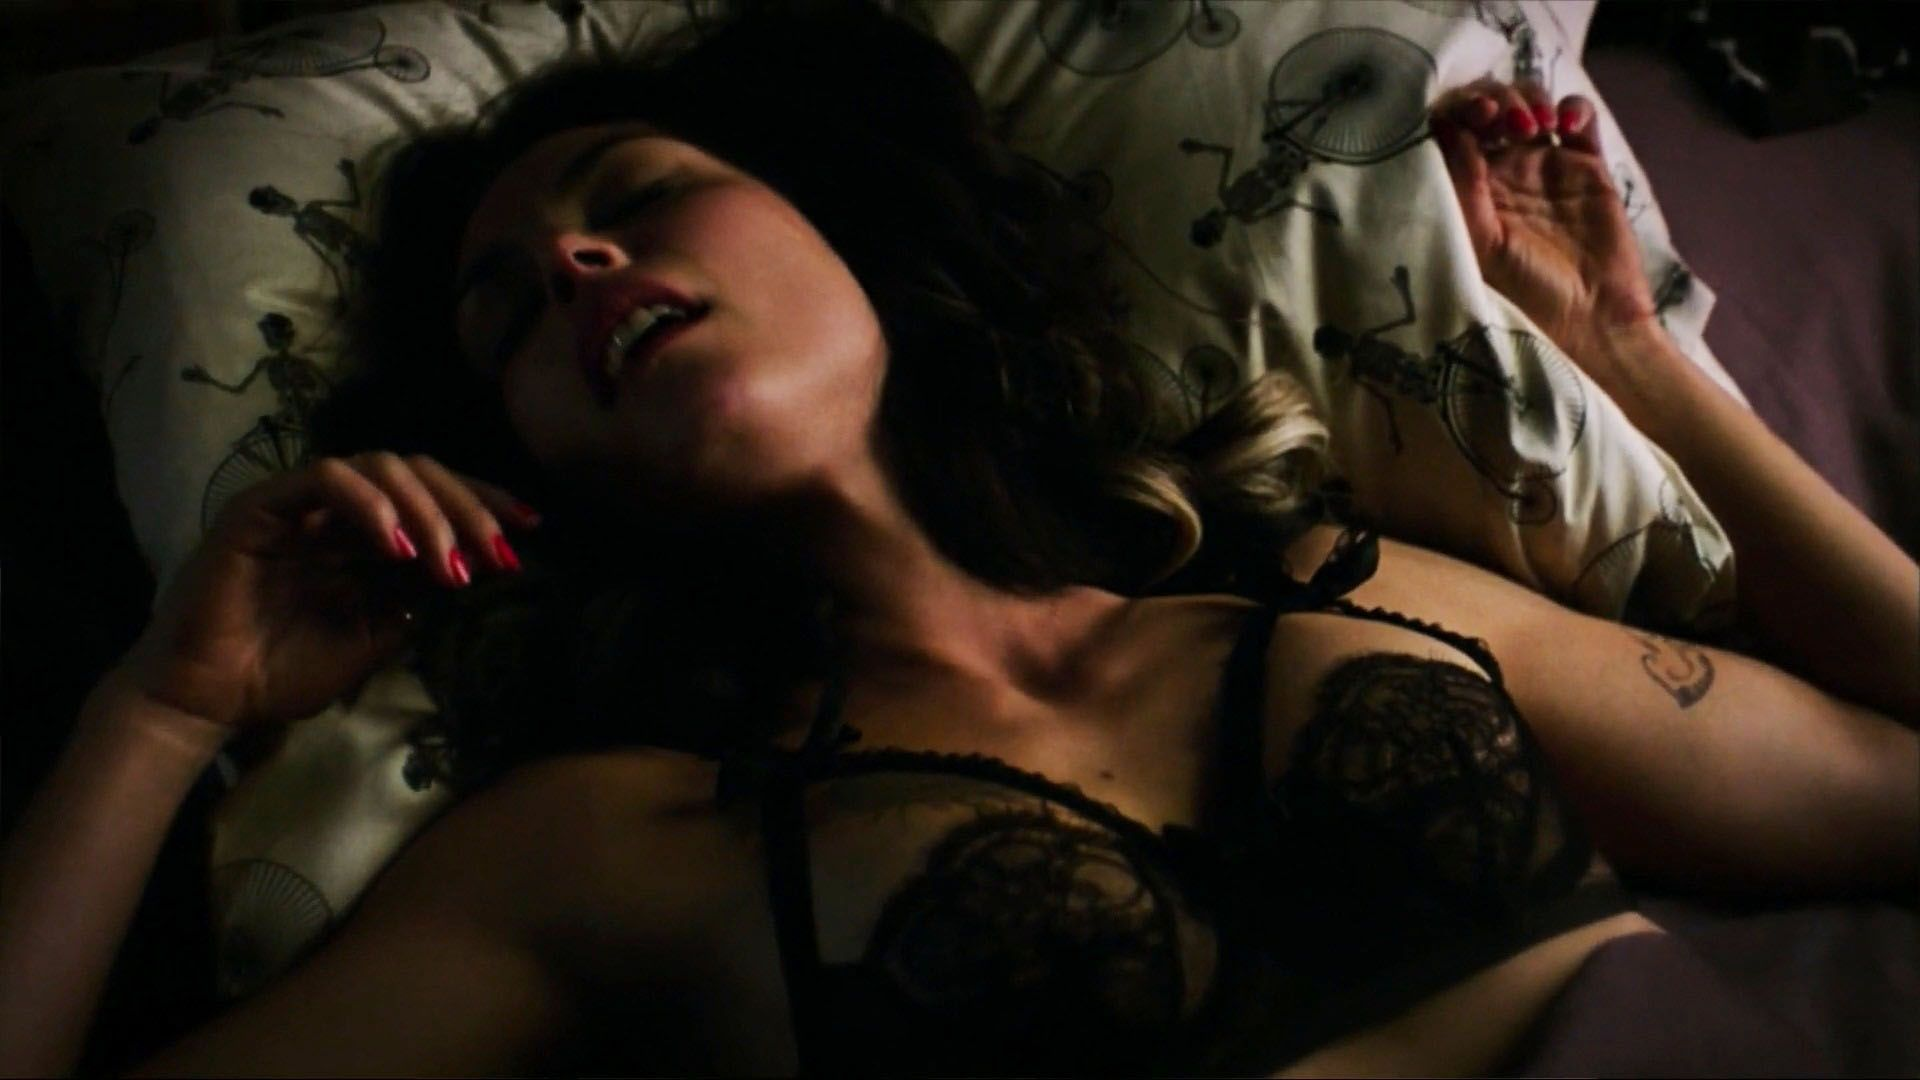 Morena Baccarin nude boobs